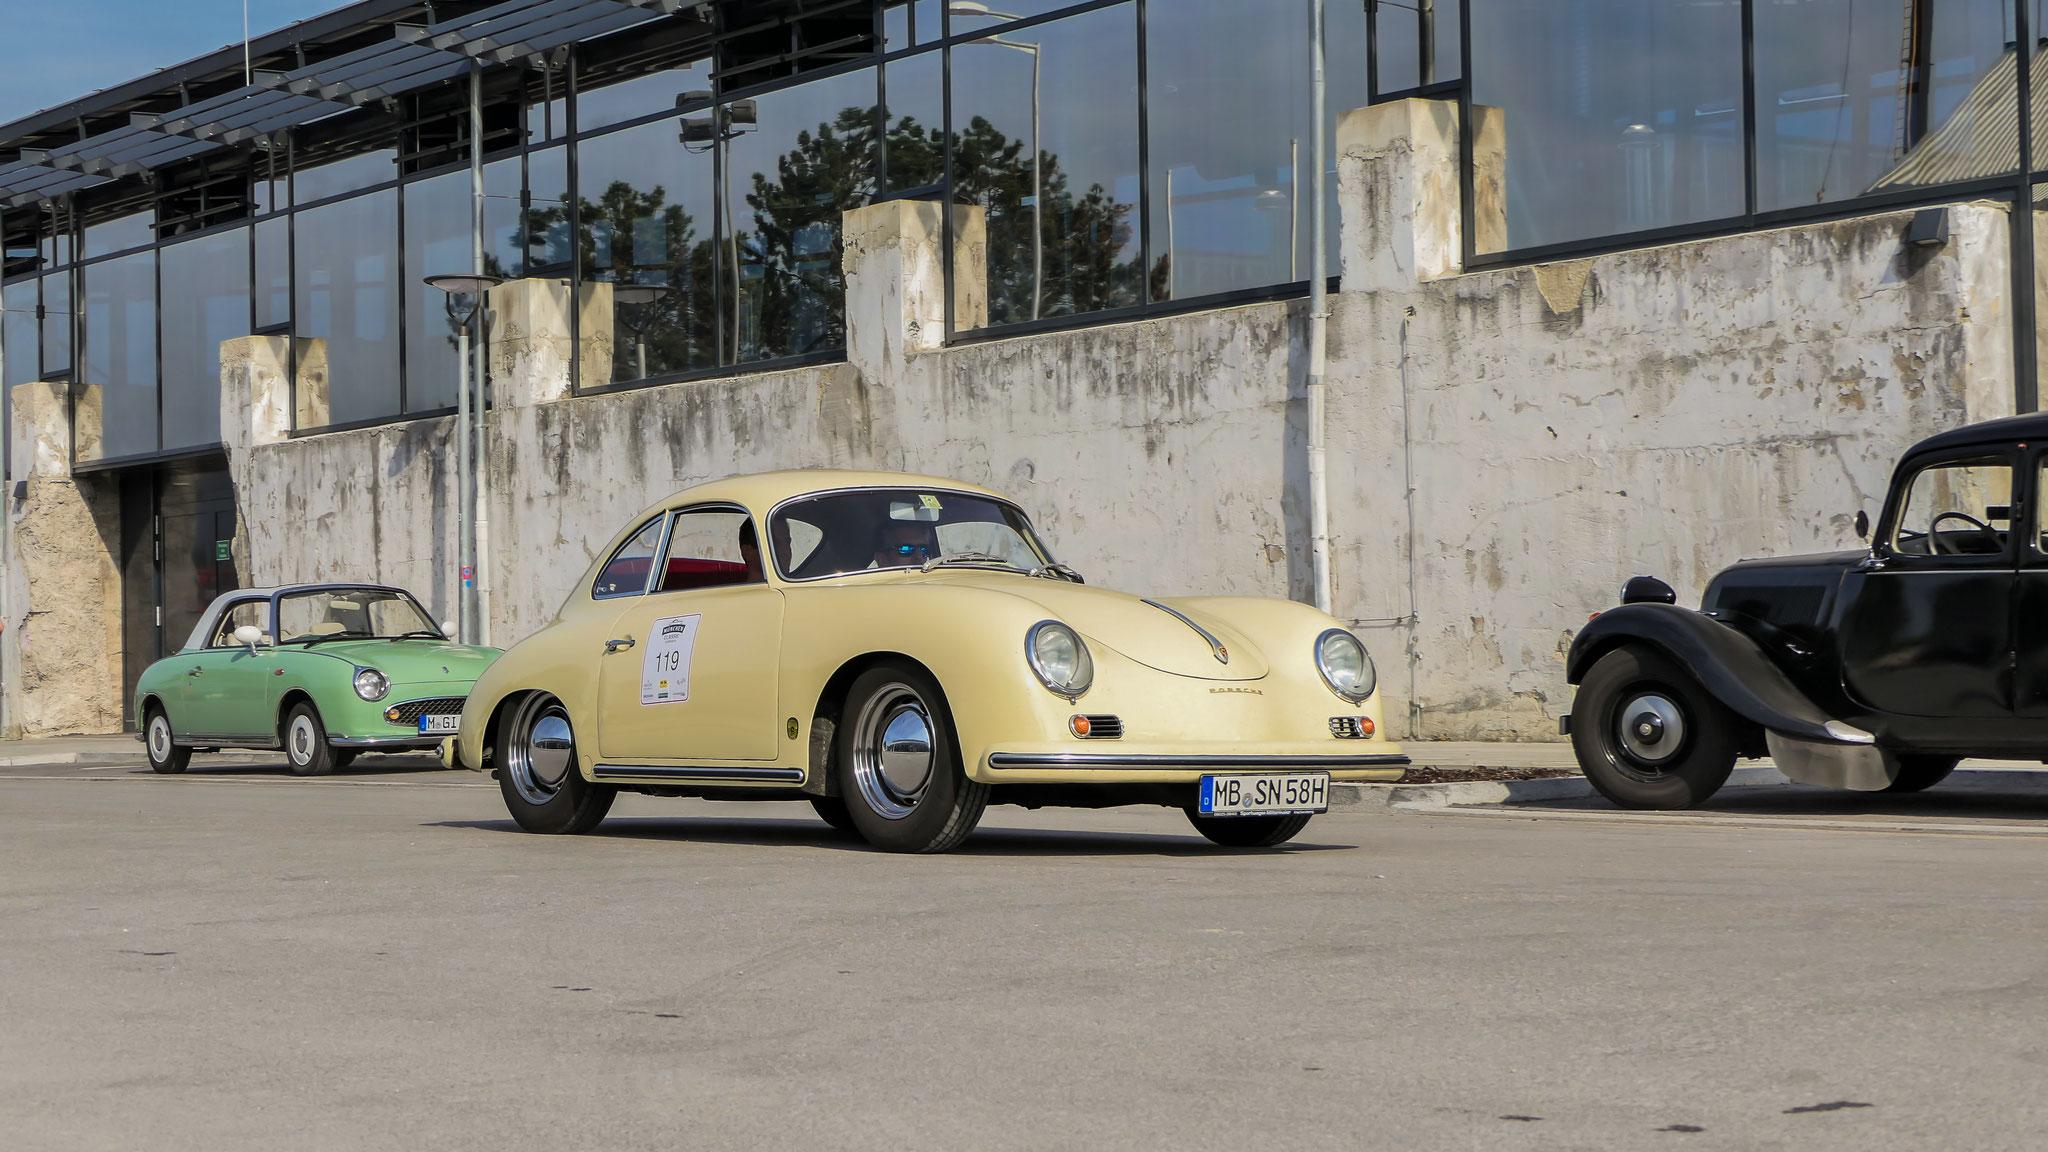 Porsche 356 1600 - MB-SN-58H